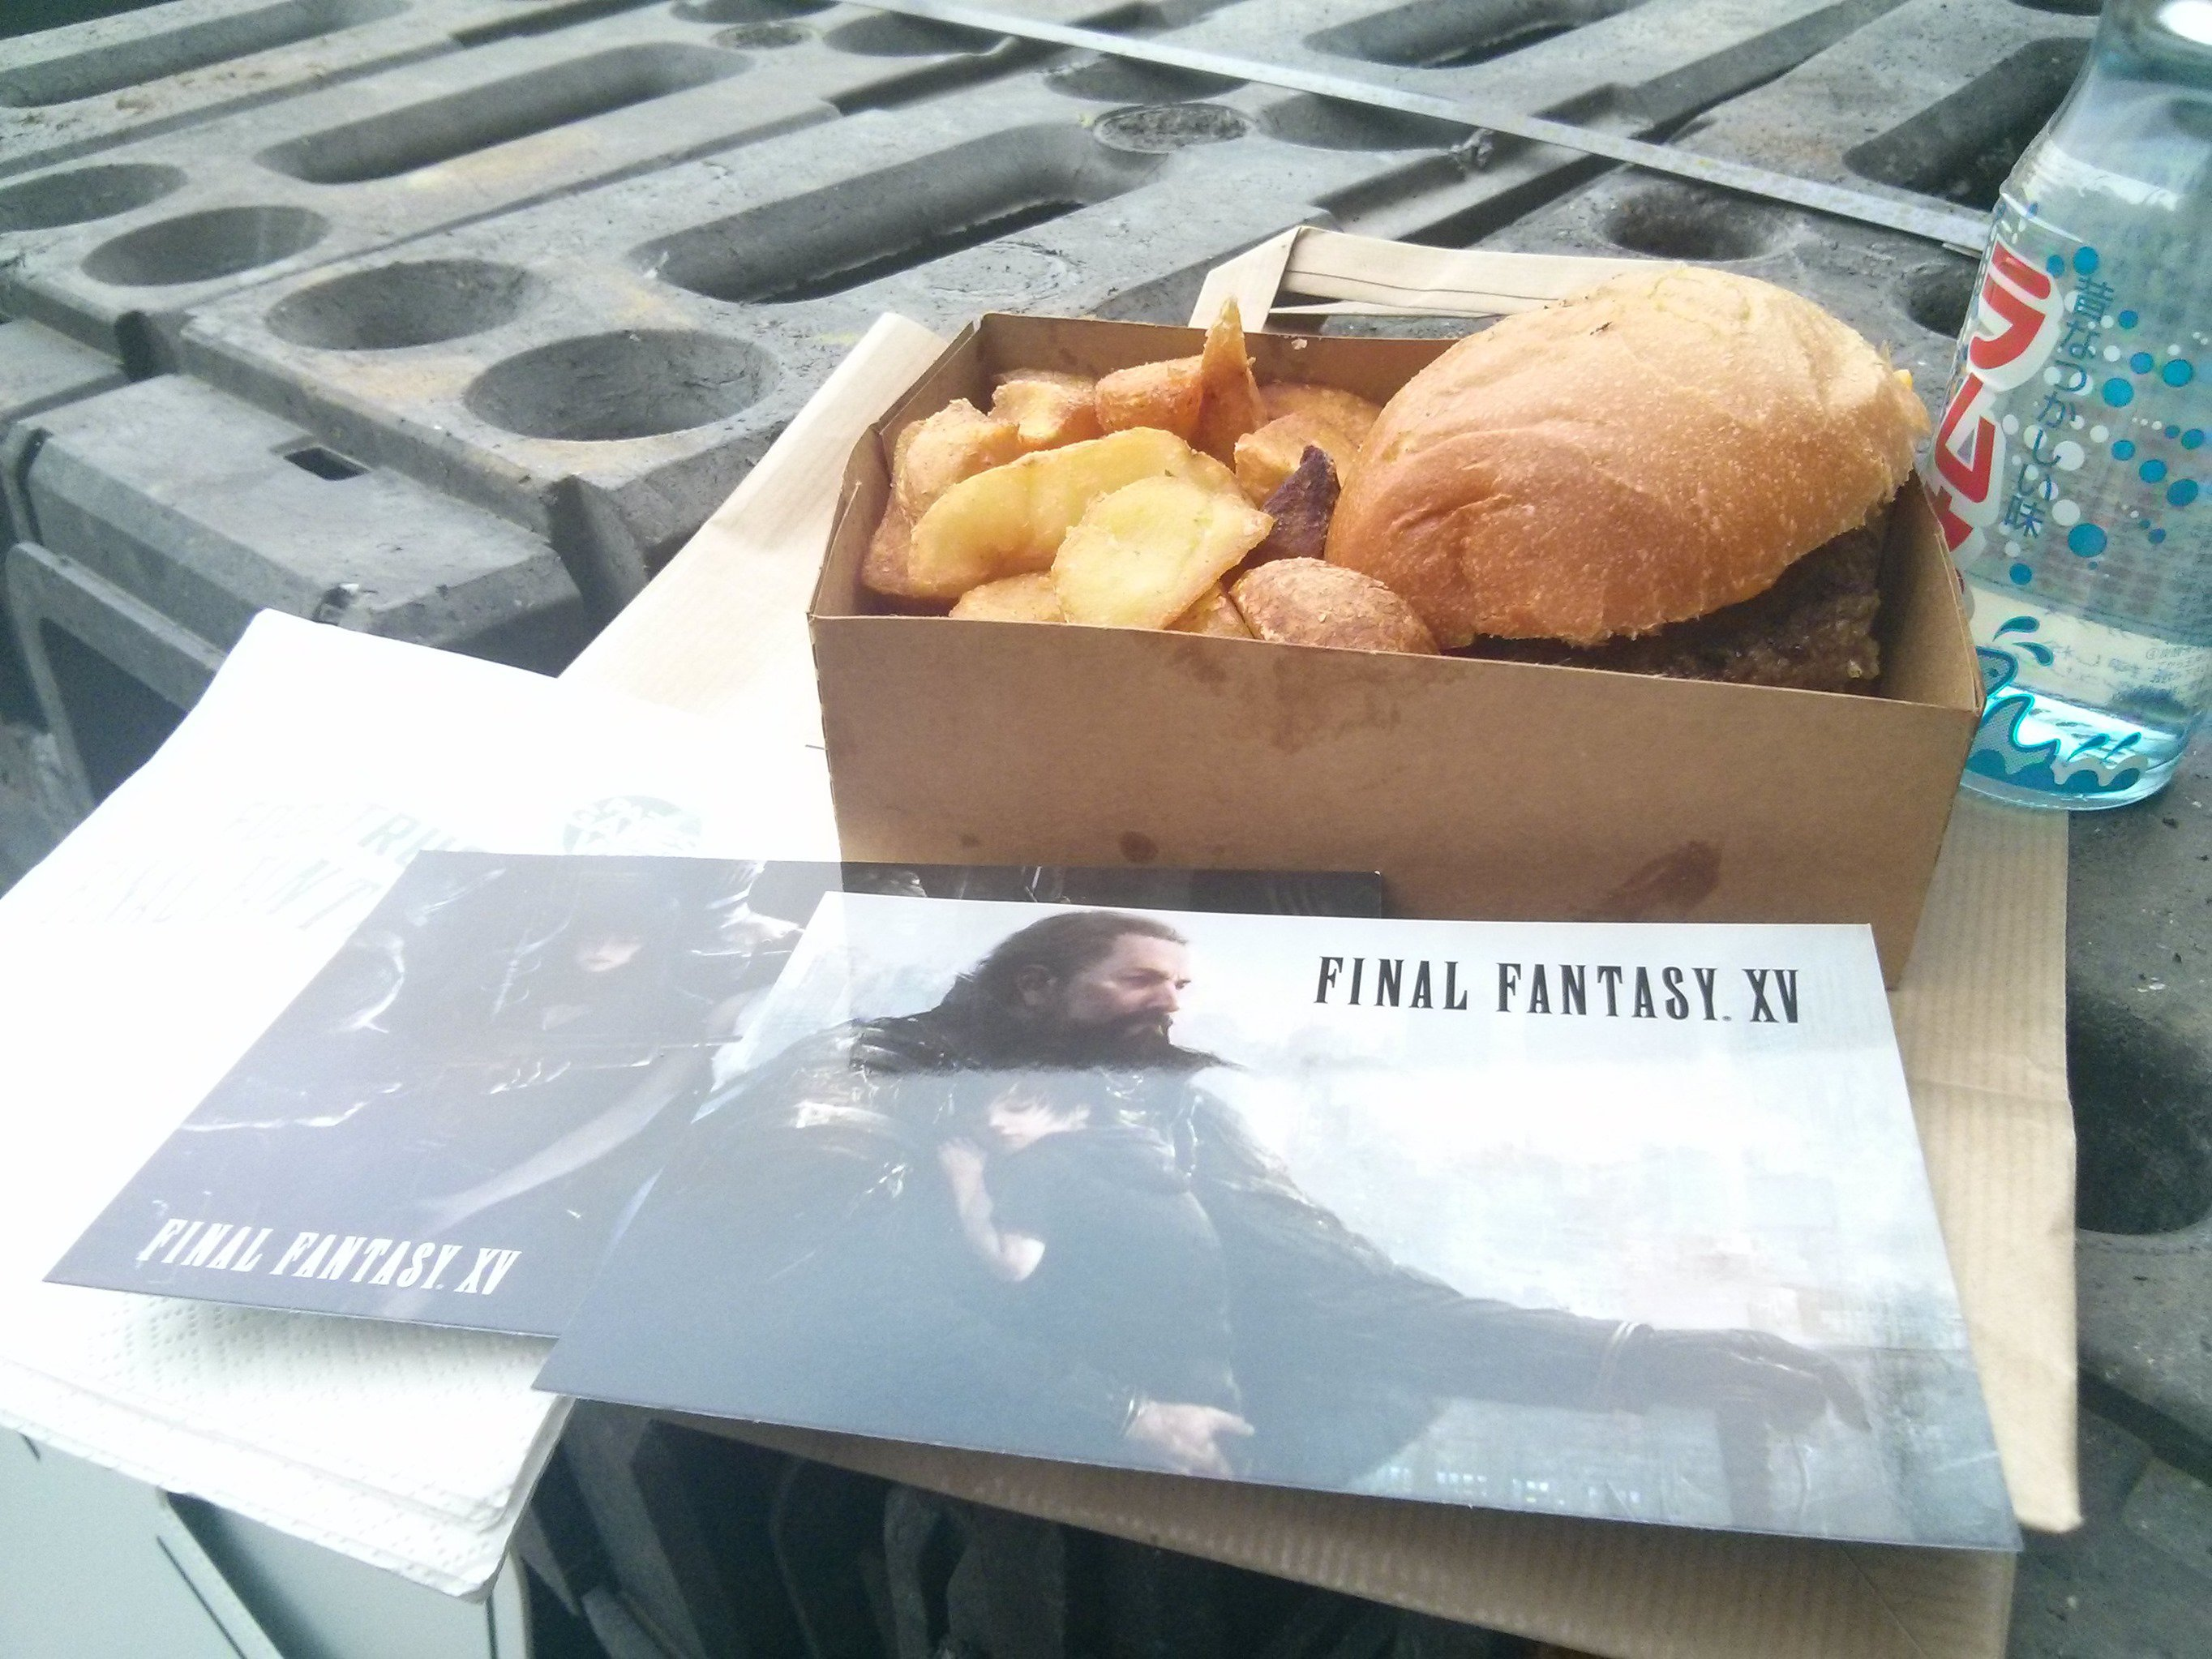 Final Fantasy XV Food Truck Serves Burgers 6